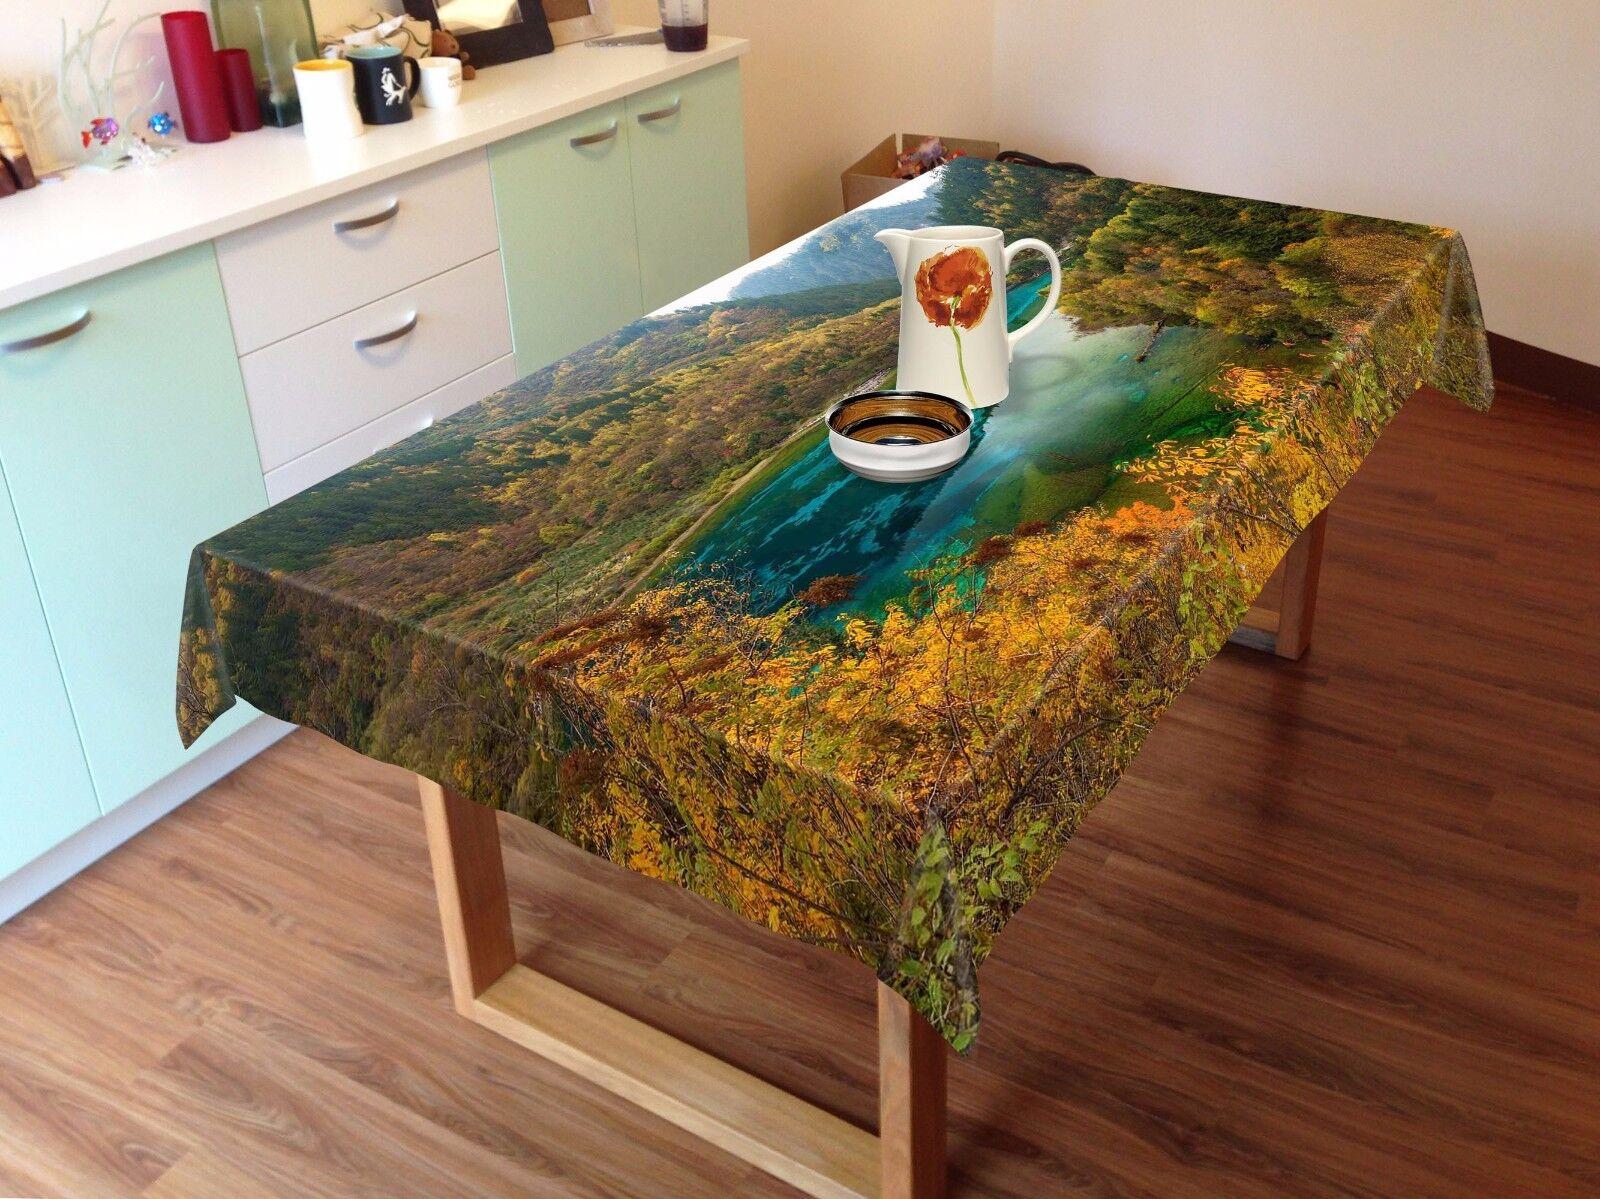 3D Mountain 5 Tablecloth Table Cover Cloth Birthday Party AJ WALLPAPER UK Lemon